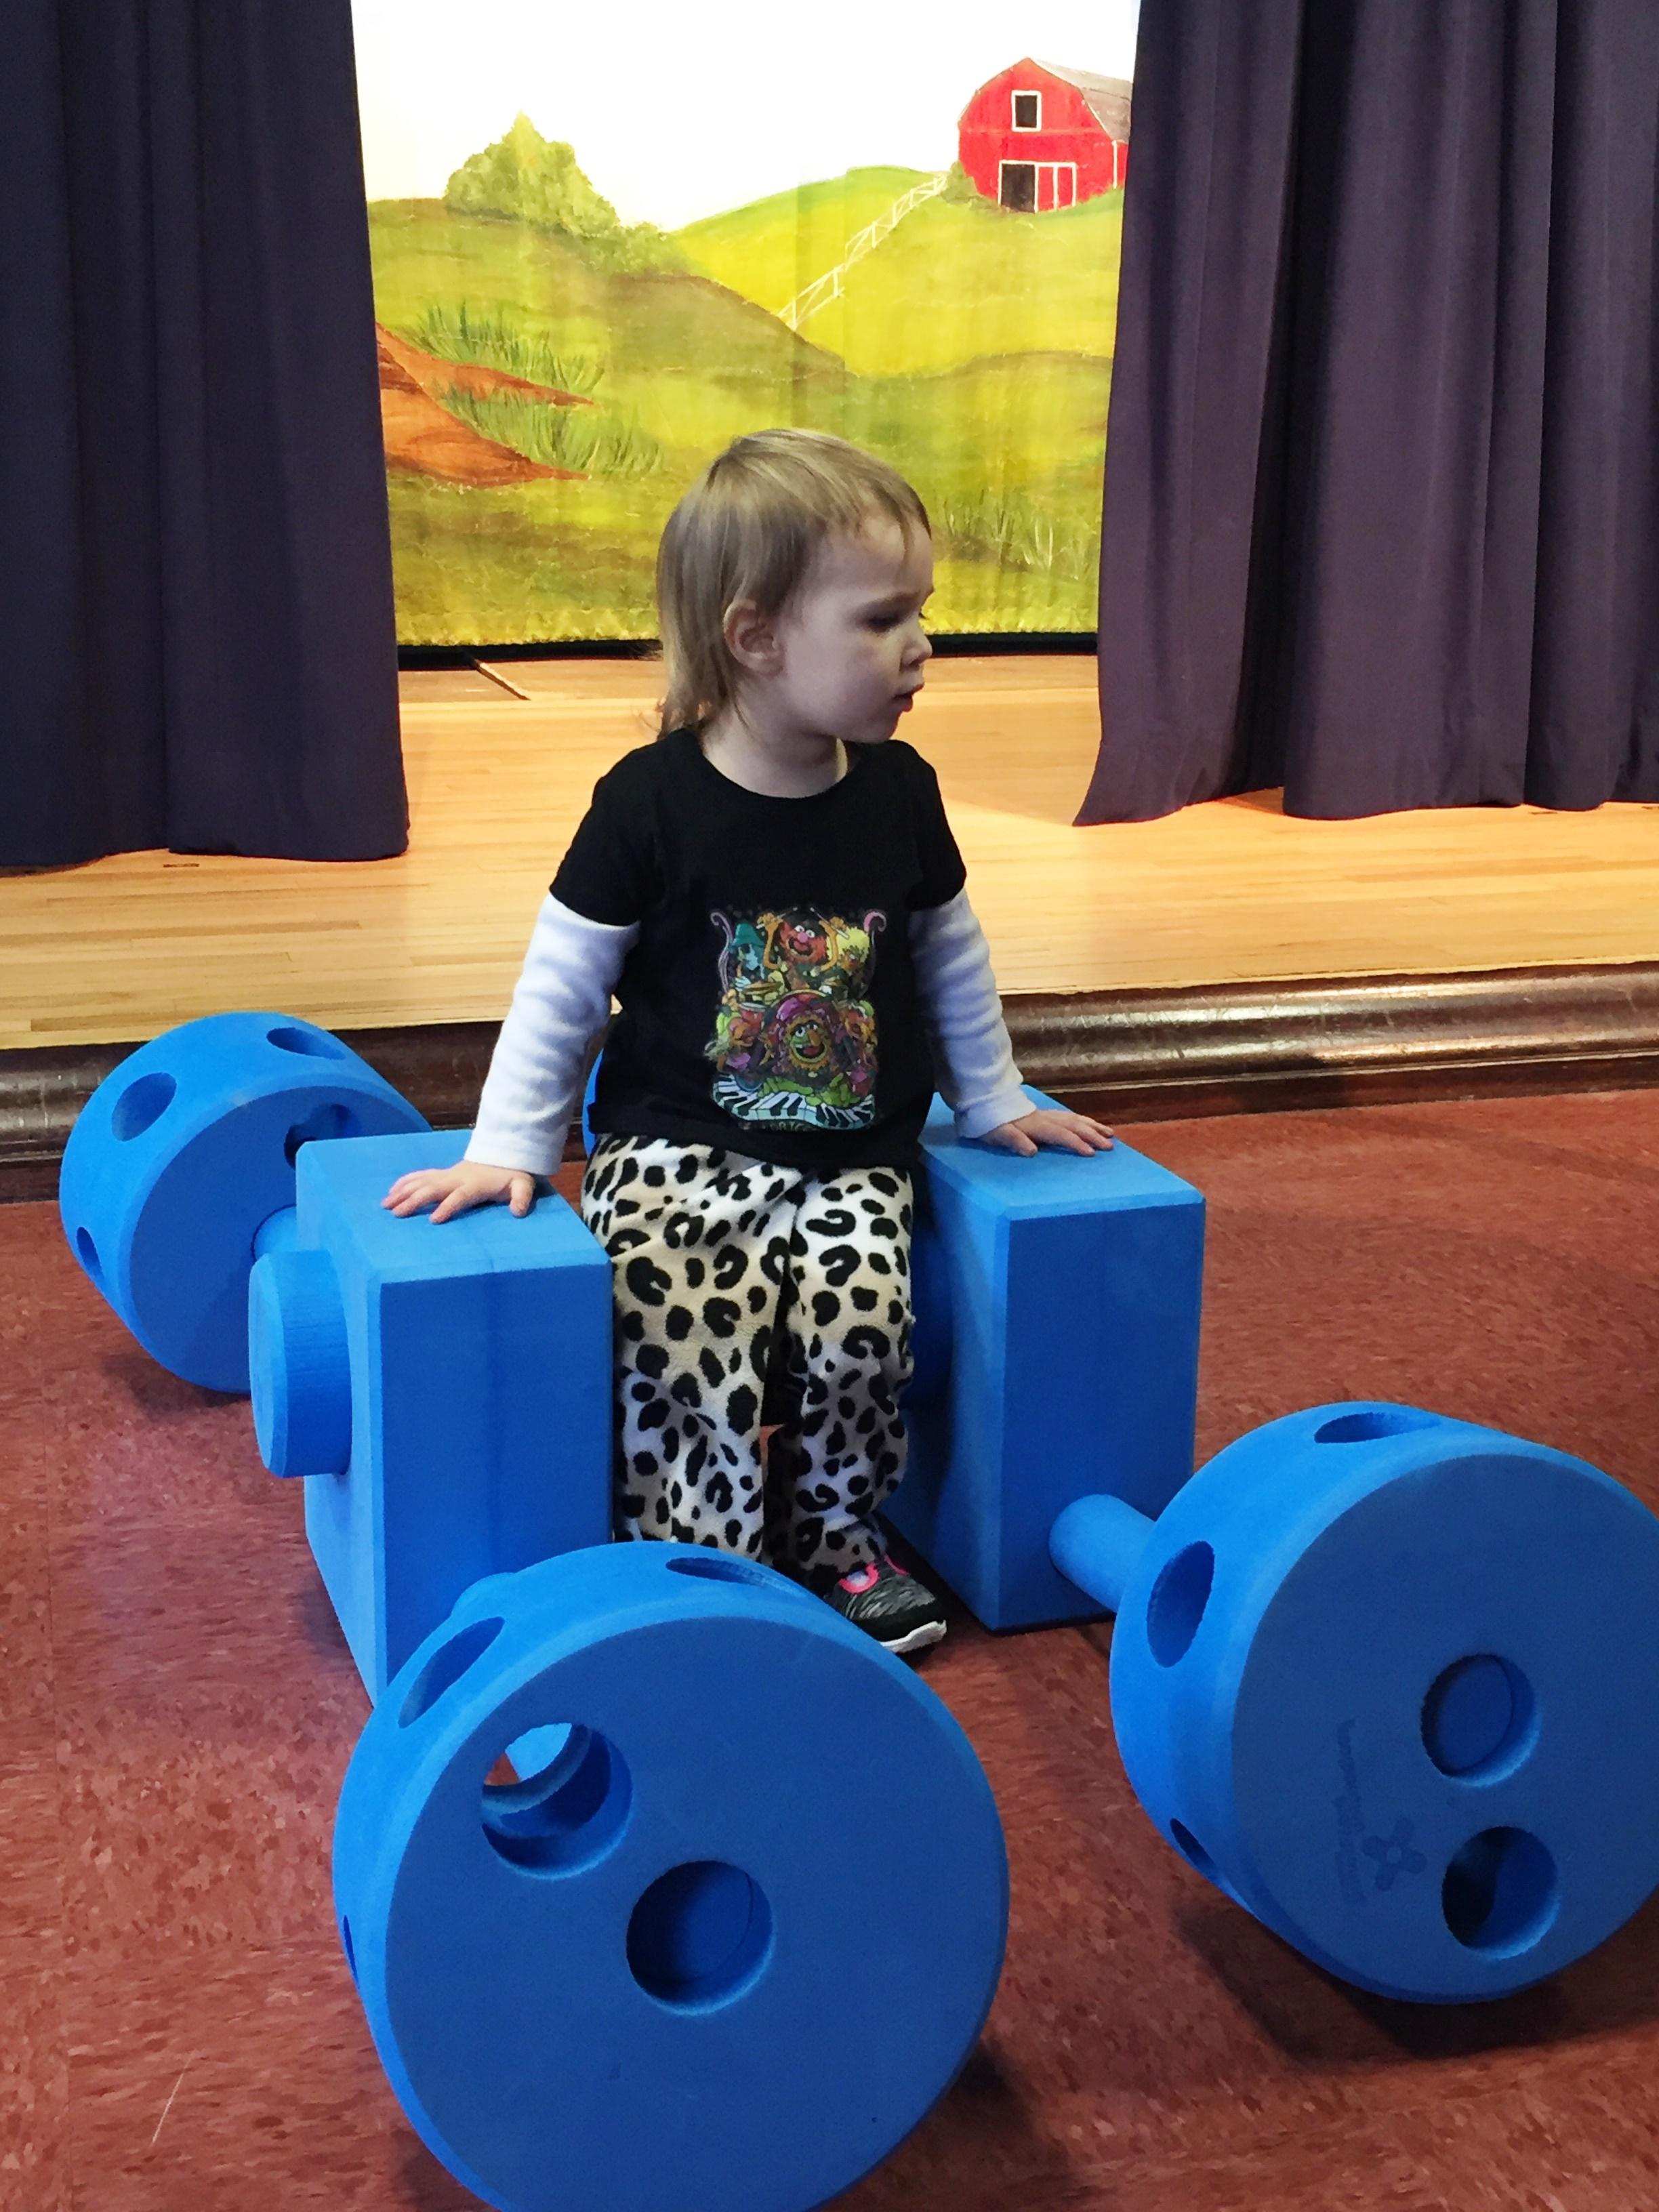 Staten Island Children's Museum: Imagination Playground